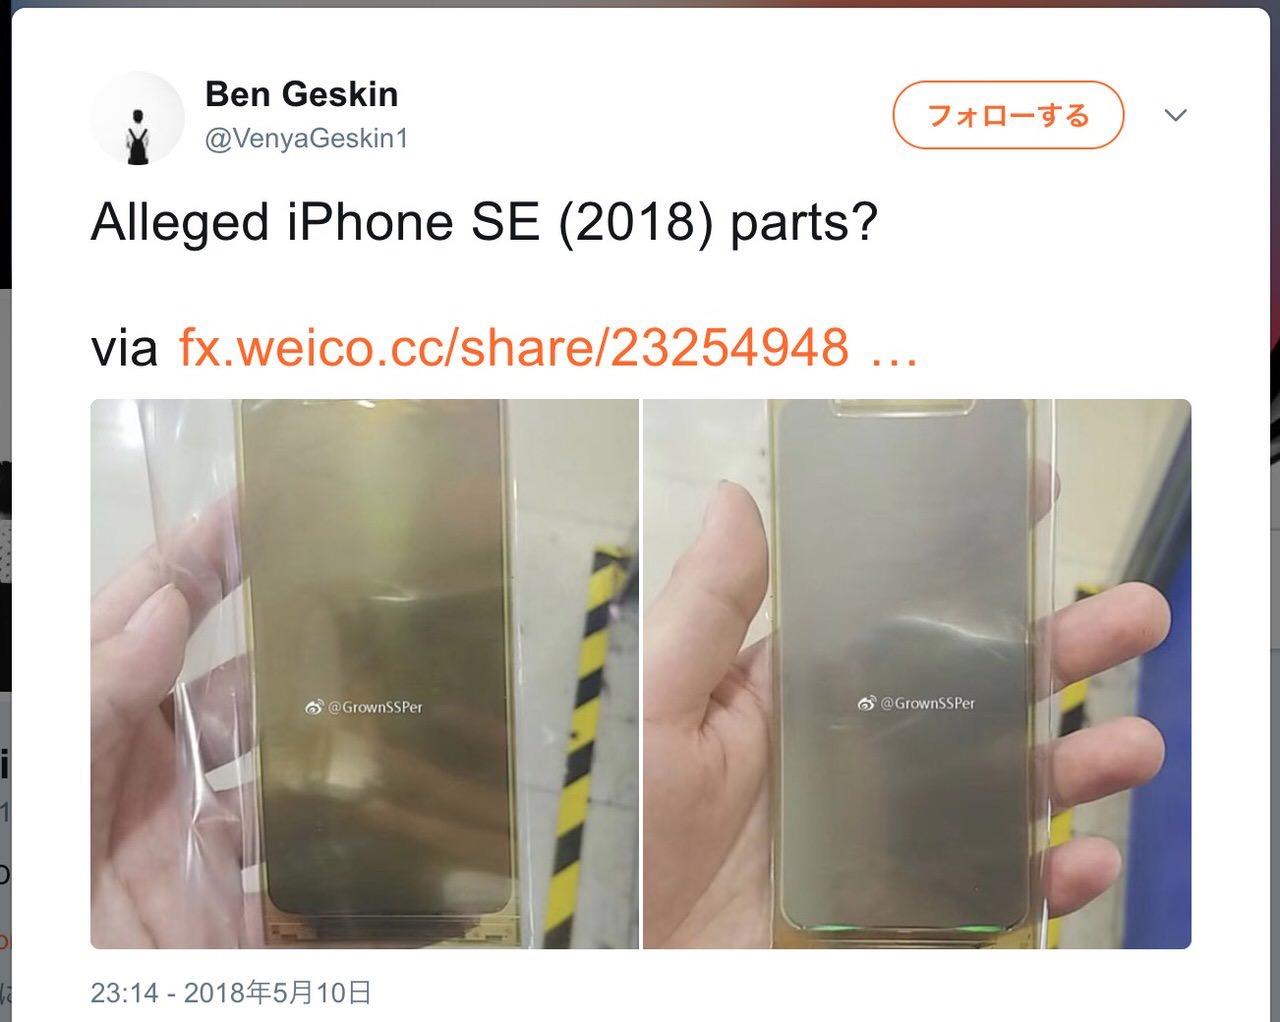 「iPhone SE2」のものと思われるiPhone Xのようなパーツが投稿される